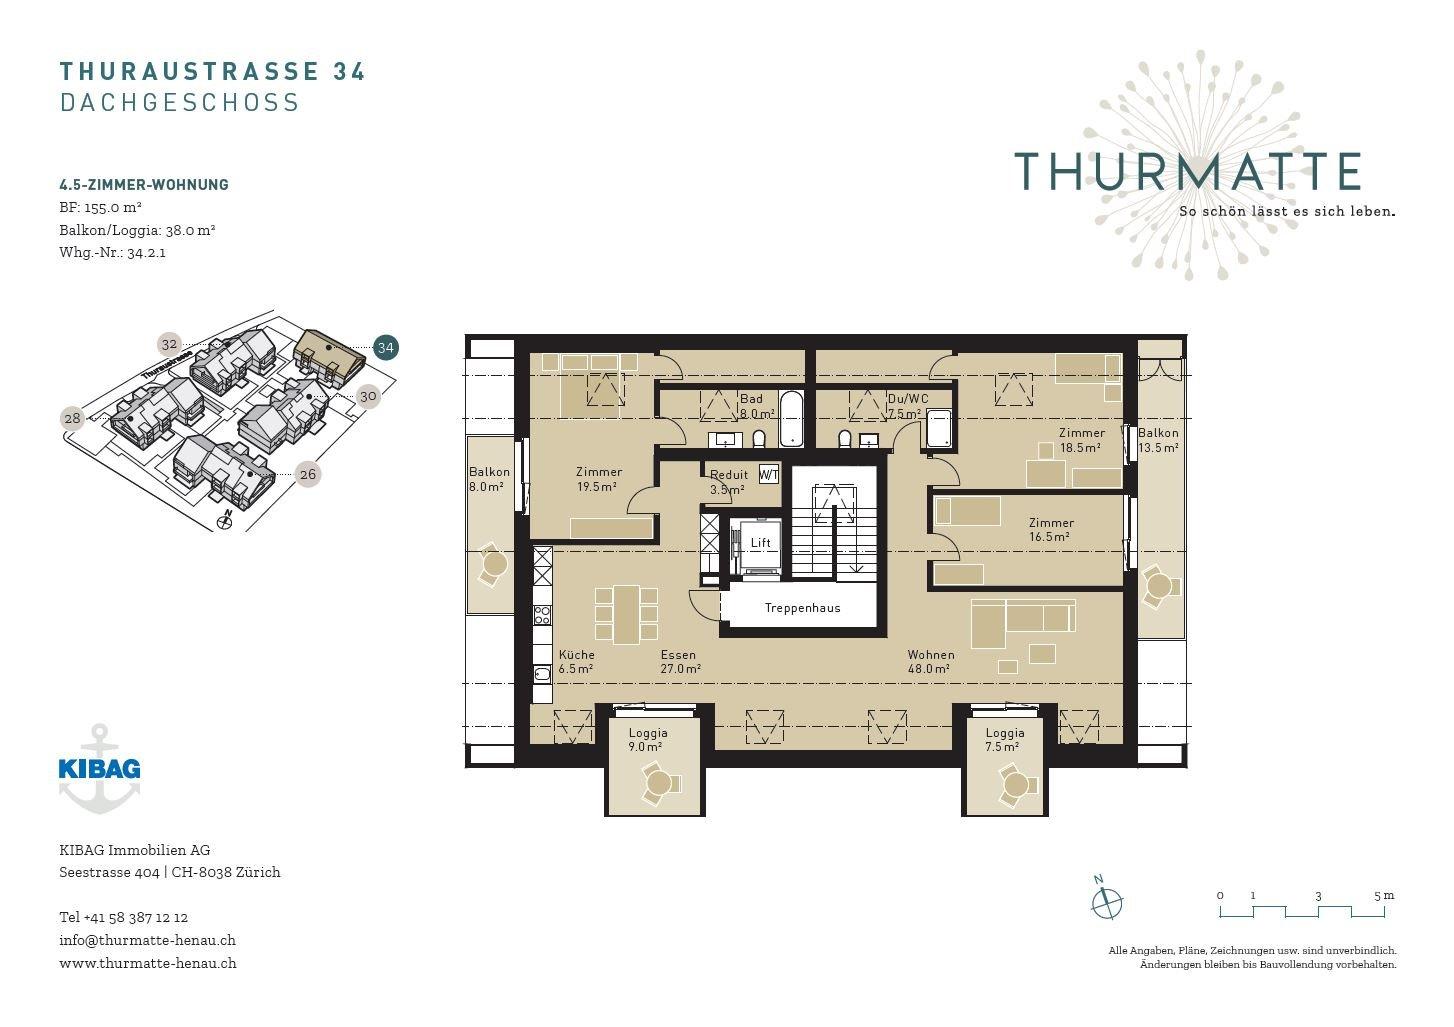 Thuraustrasse 34